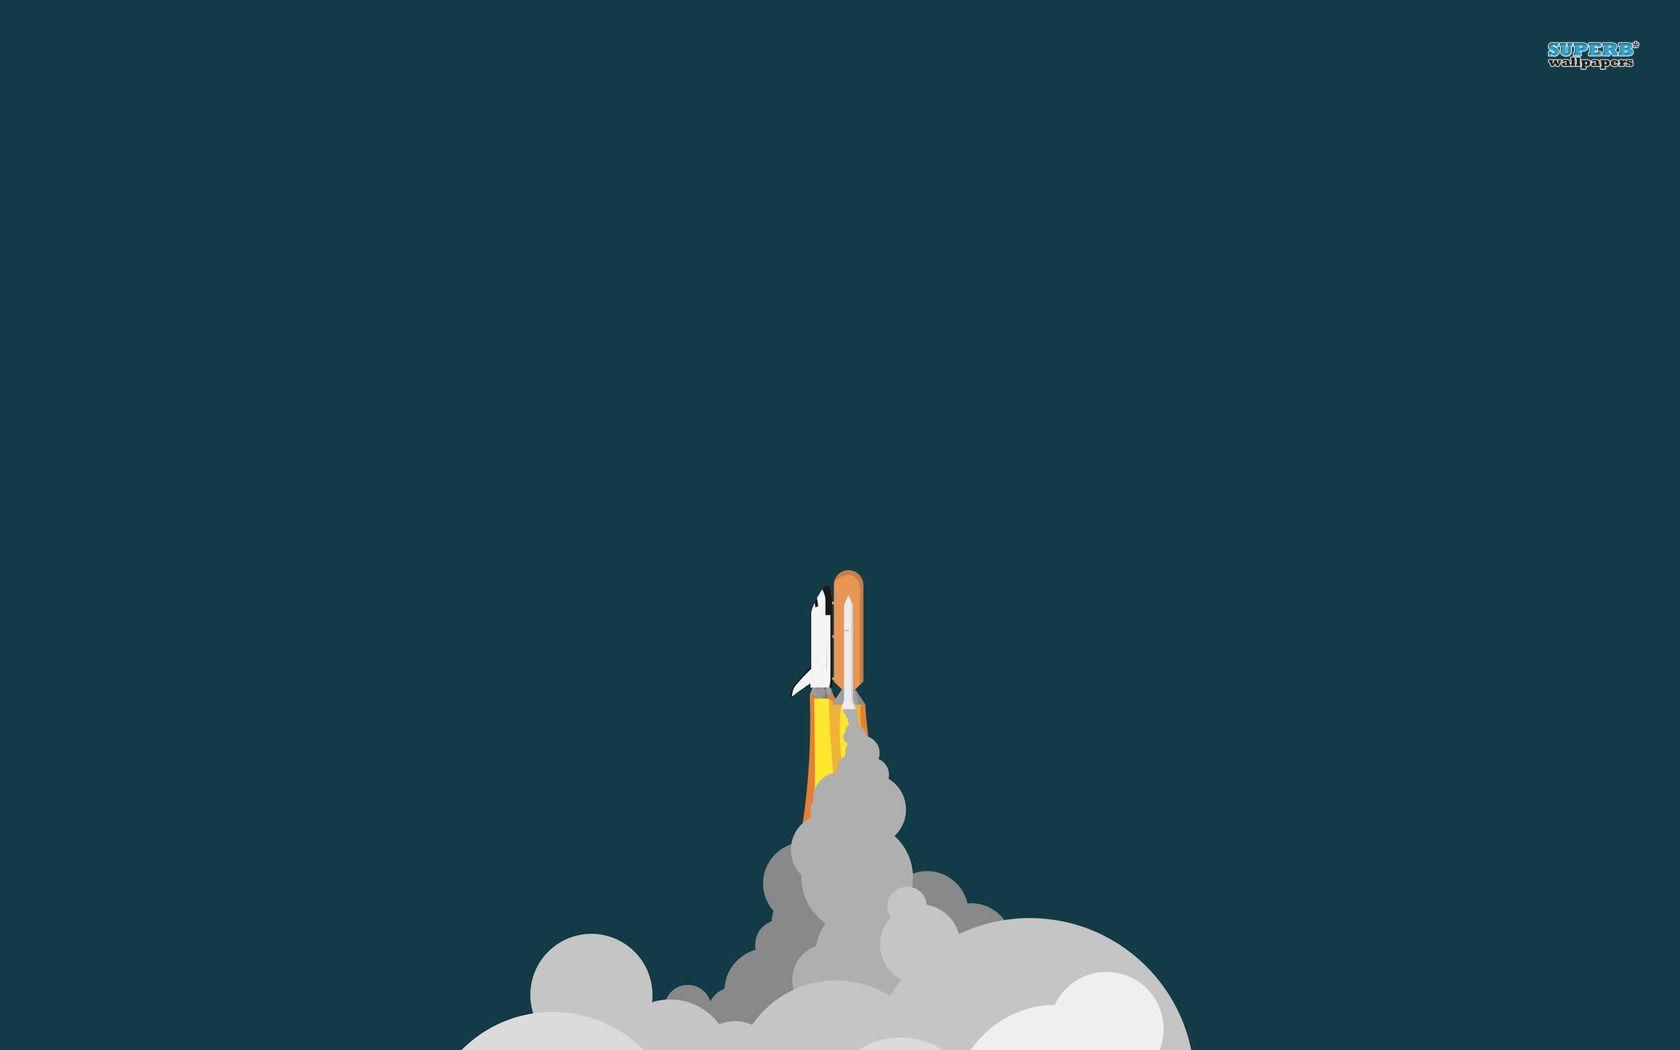 Space Shuttle Wallpaper Minimal Wallpaper Art Poster Design Wallpaper